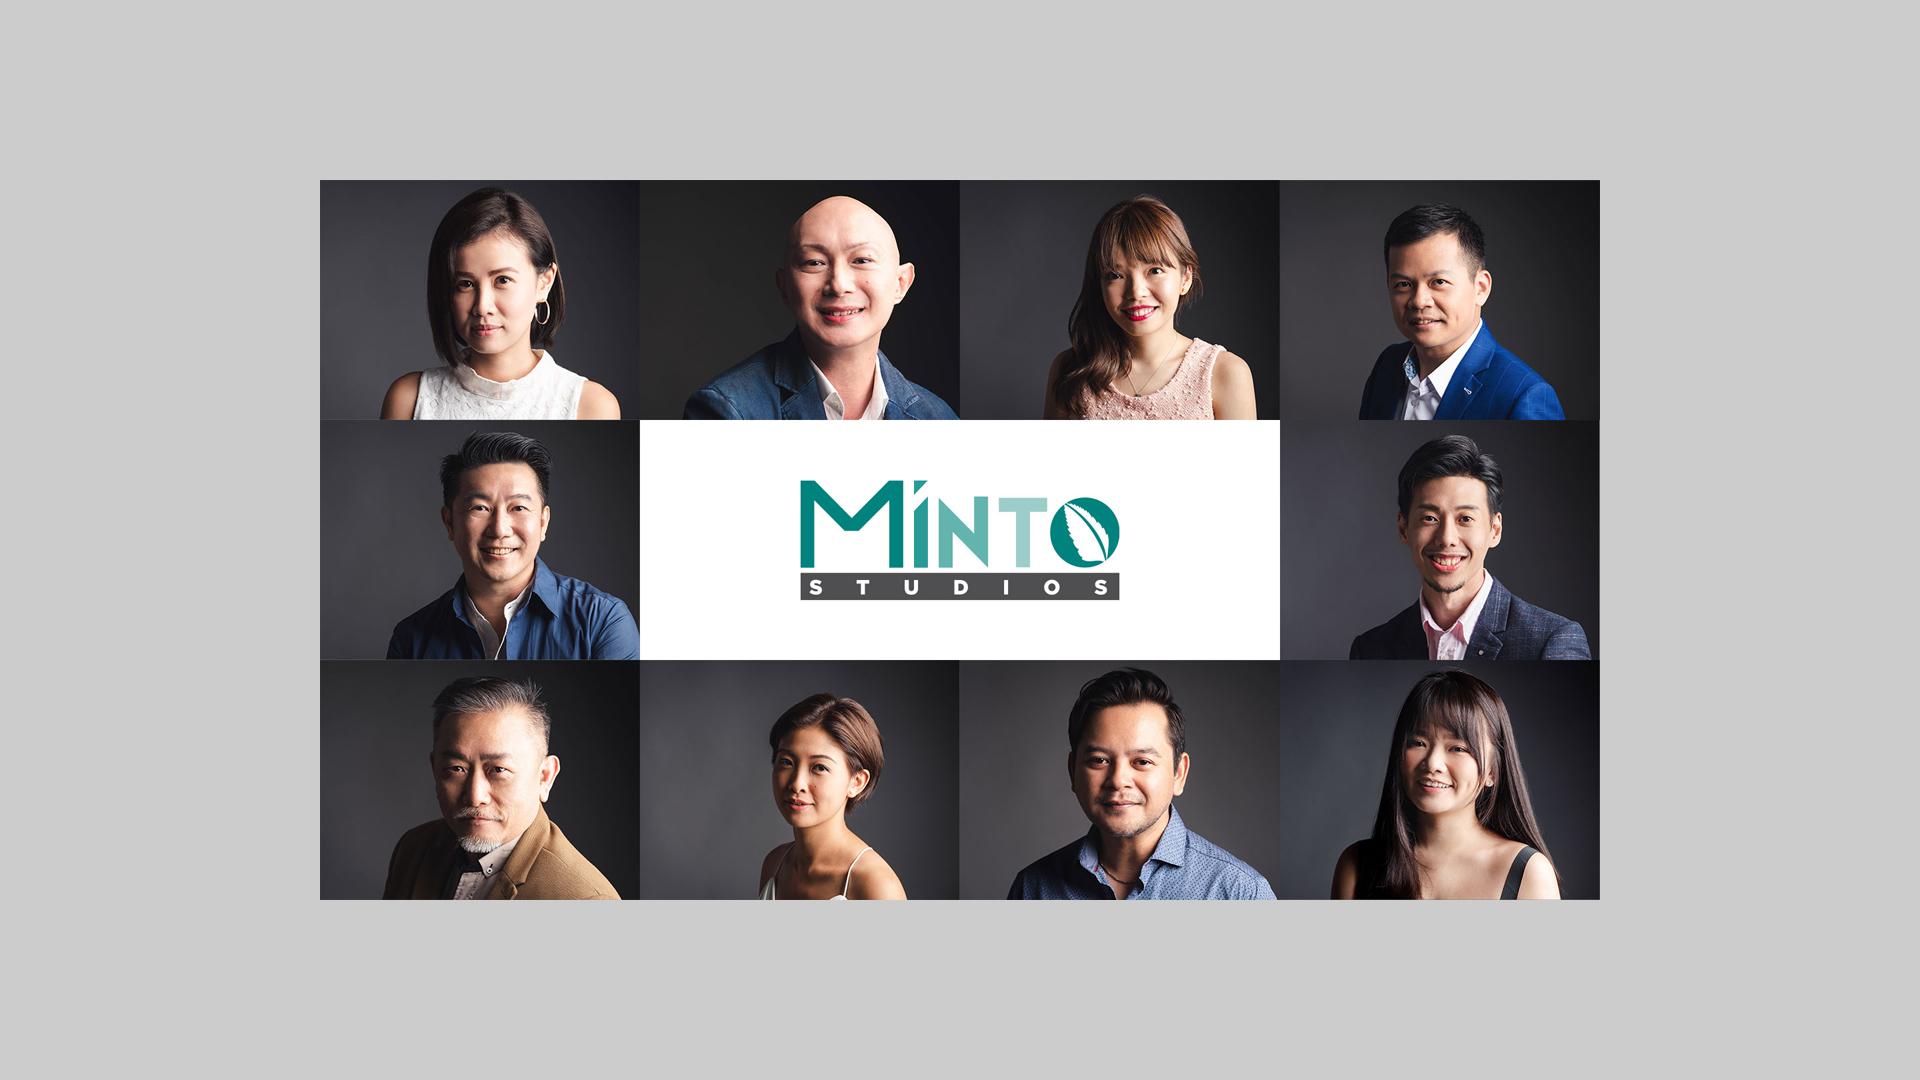 New Partner: Minto Studios